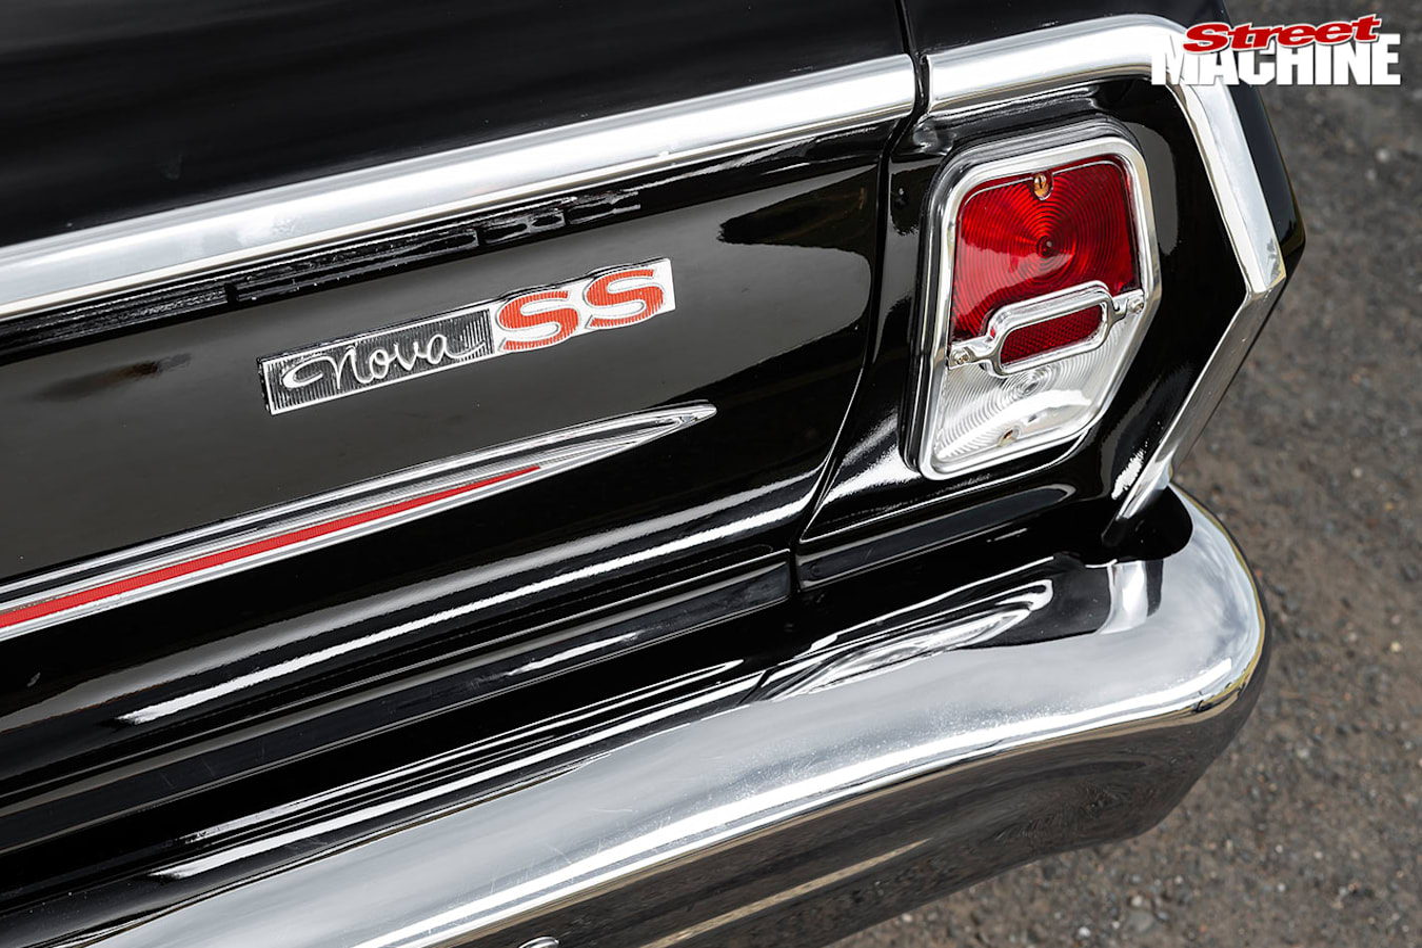 Chevrolet Nova SS tail light